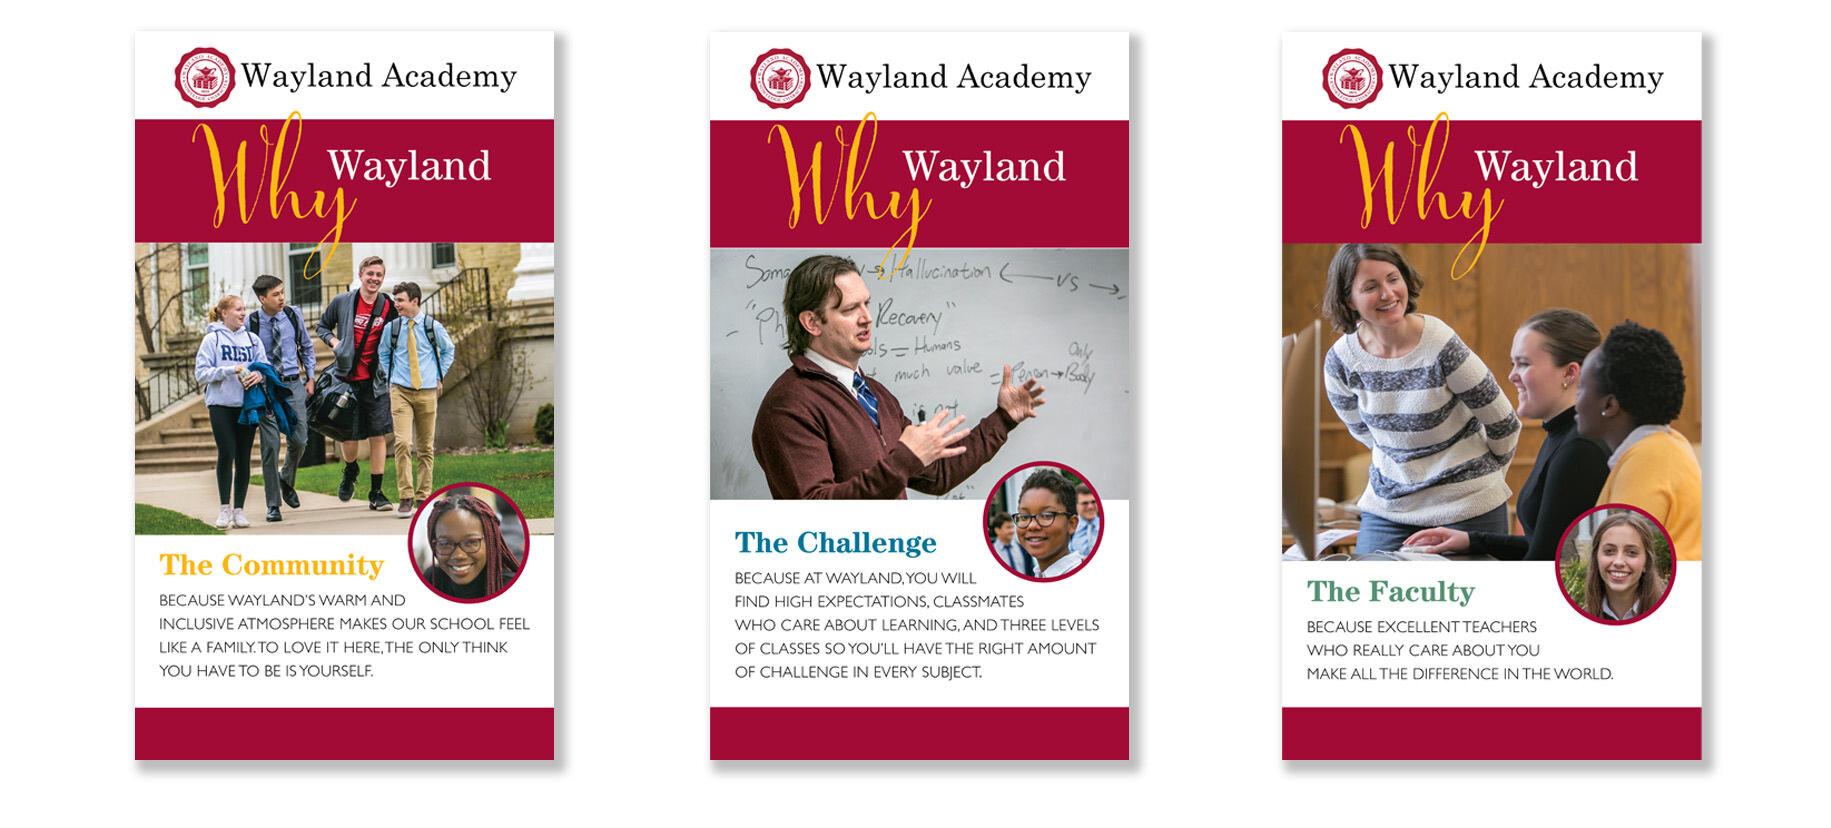 wayland-academy-email-campaign-kelsh-wilson.jpg